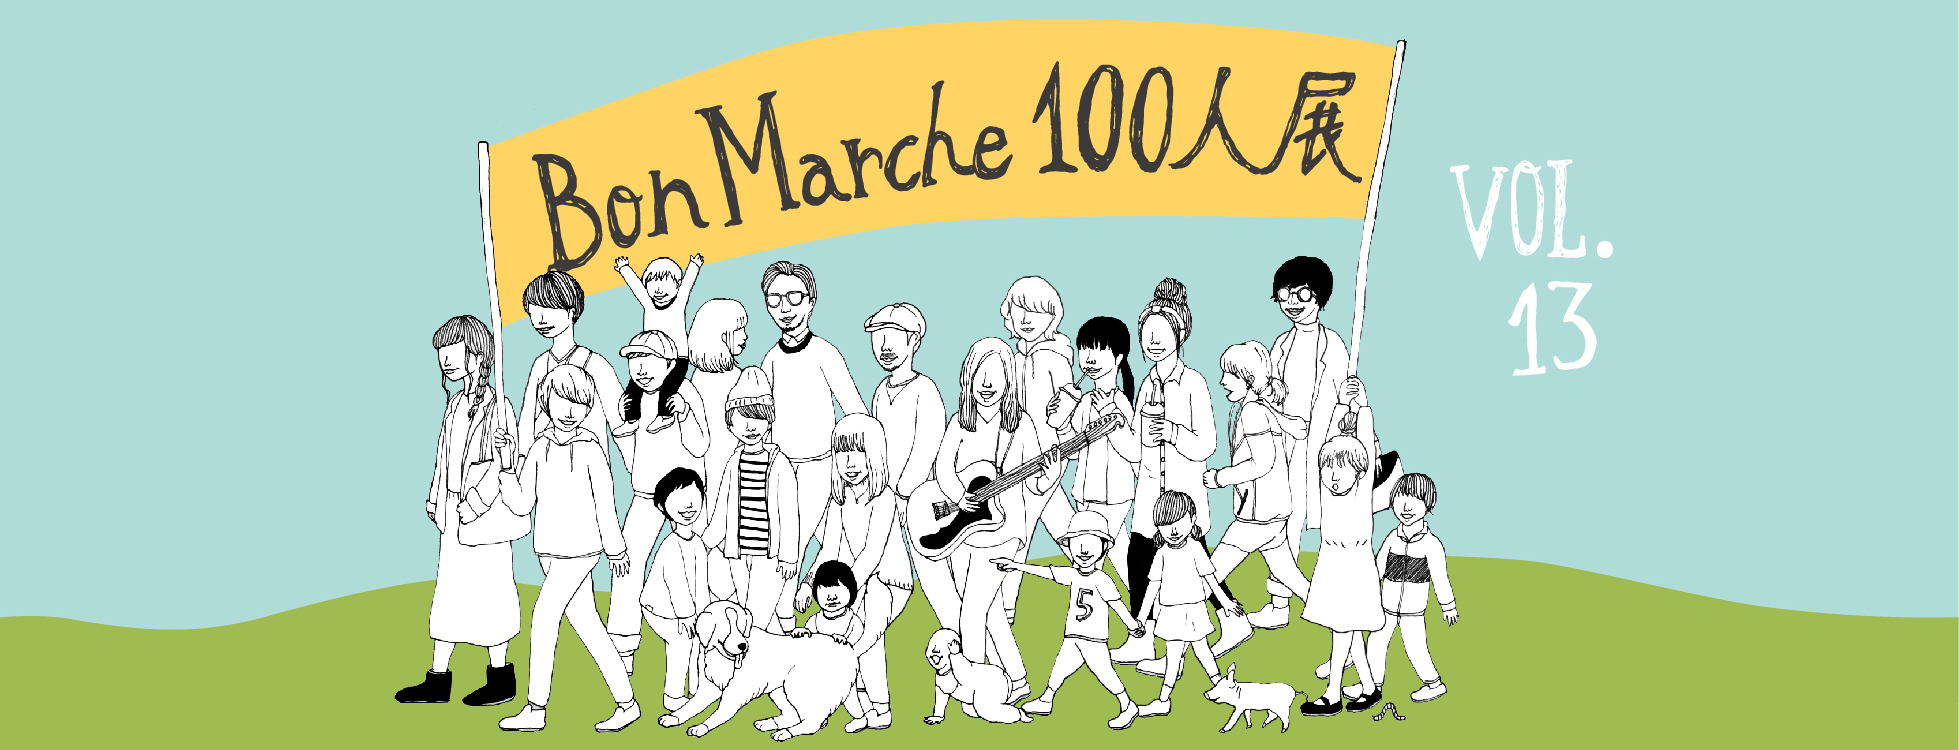 BonMarche100人展Vol.13 出展者の皆さまへ!